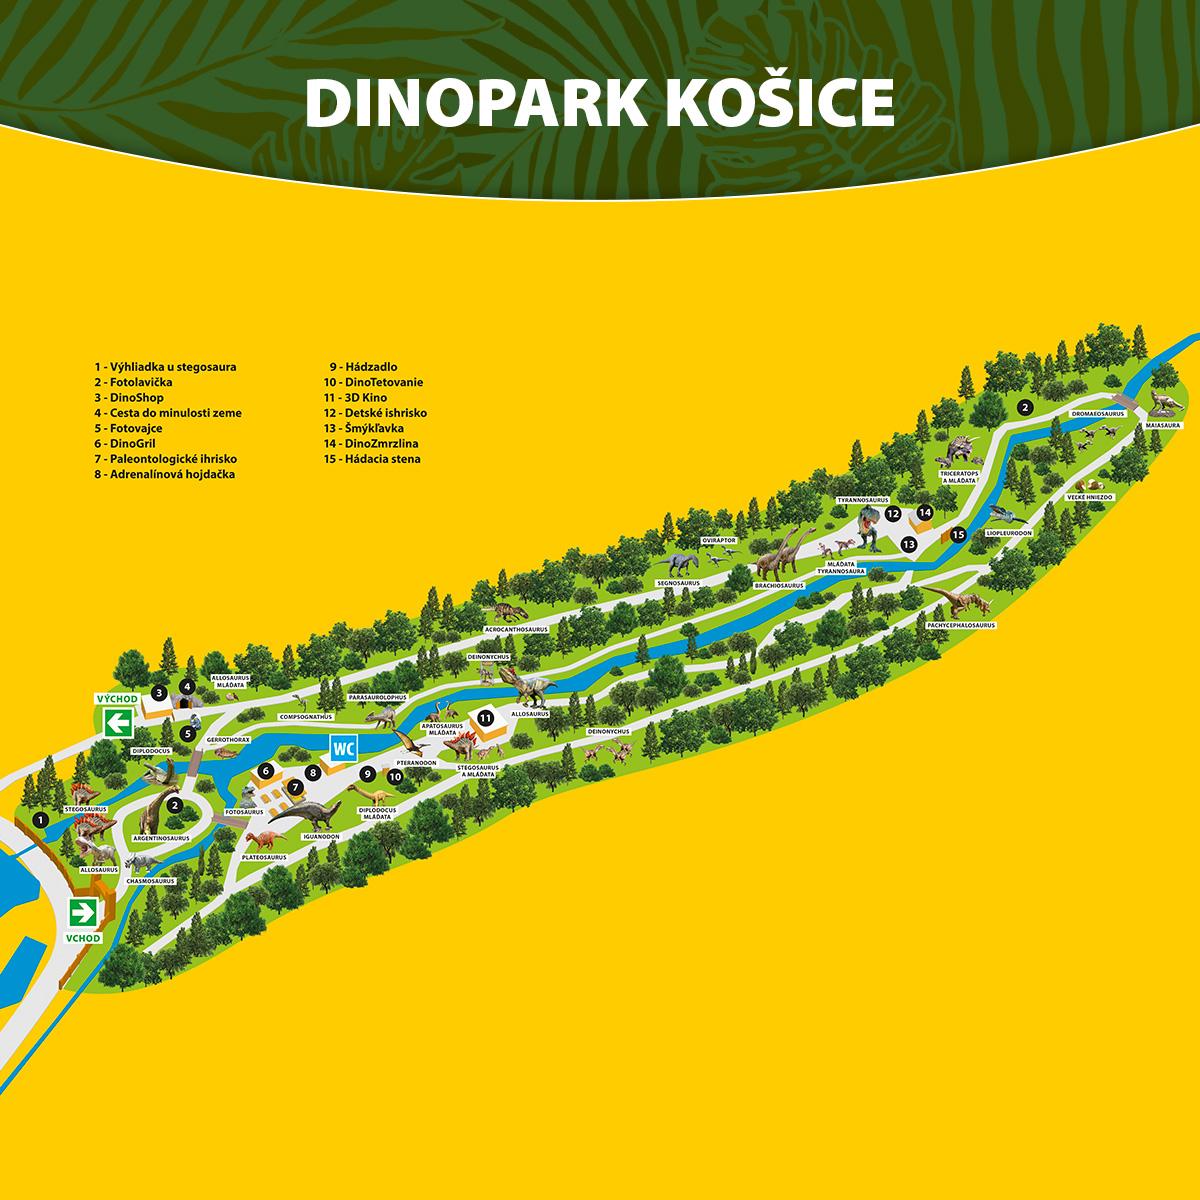 https://www.dinopark.sk/images/planek-dinopark-kosice.jpg